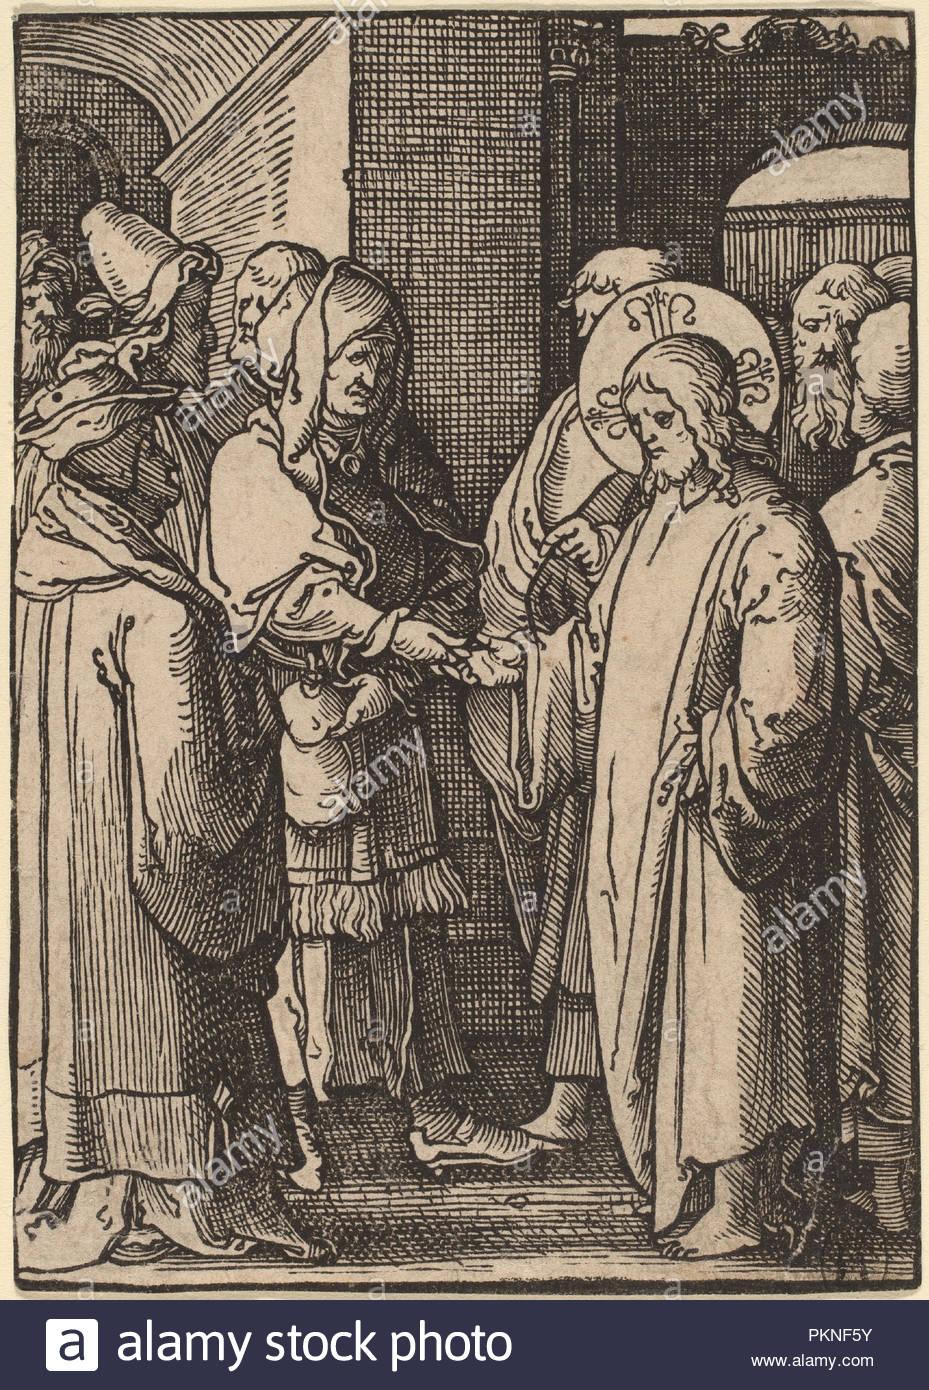 1523. Medium: woodcut. Museum: National Gallery of Art, Washington DC.  Author: LUCAS VAN LEYDEN.